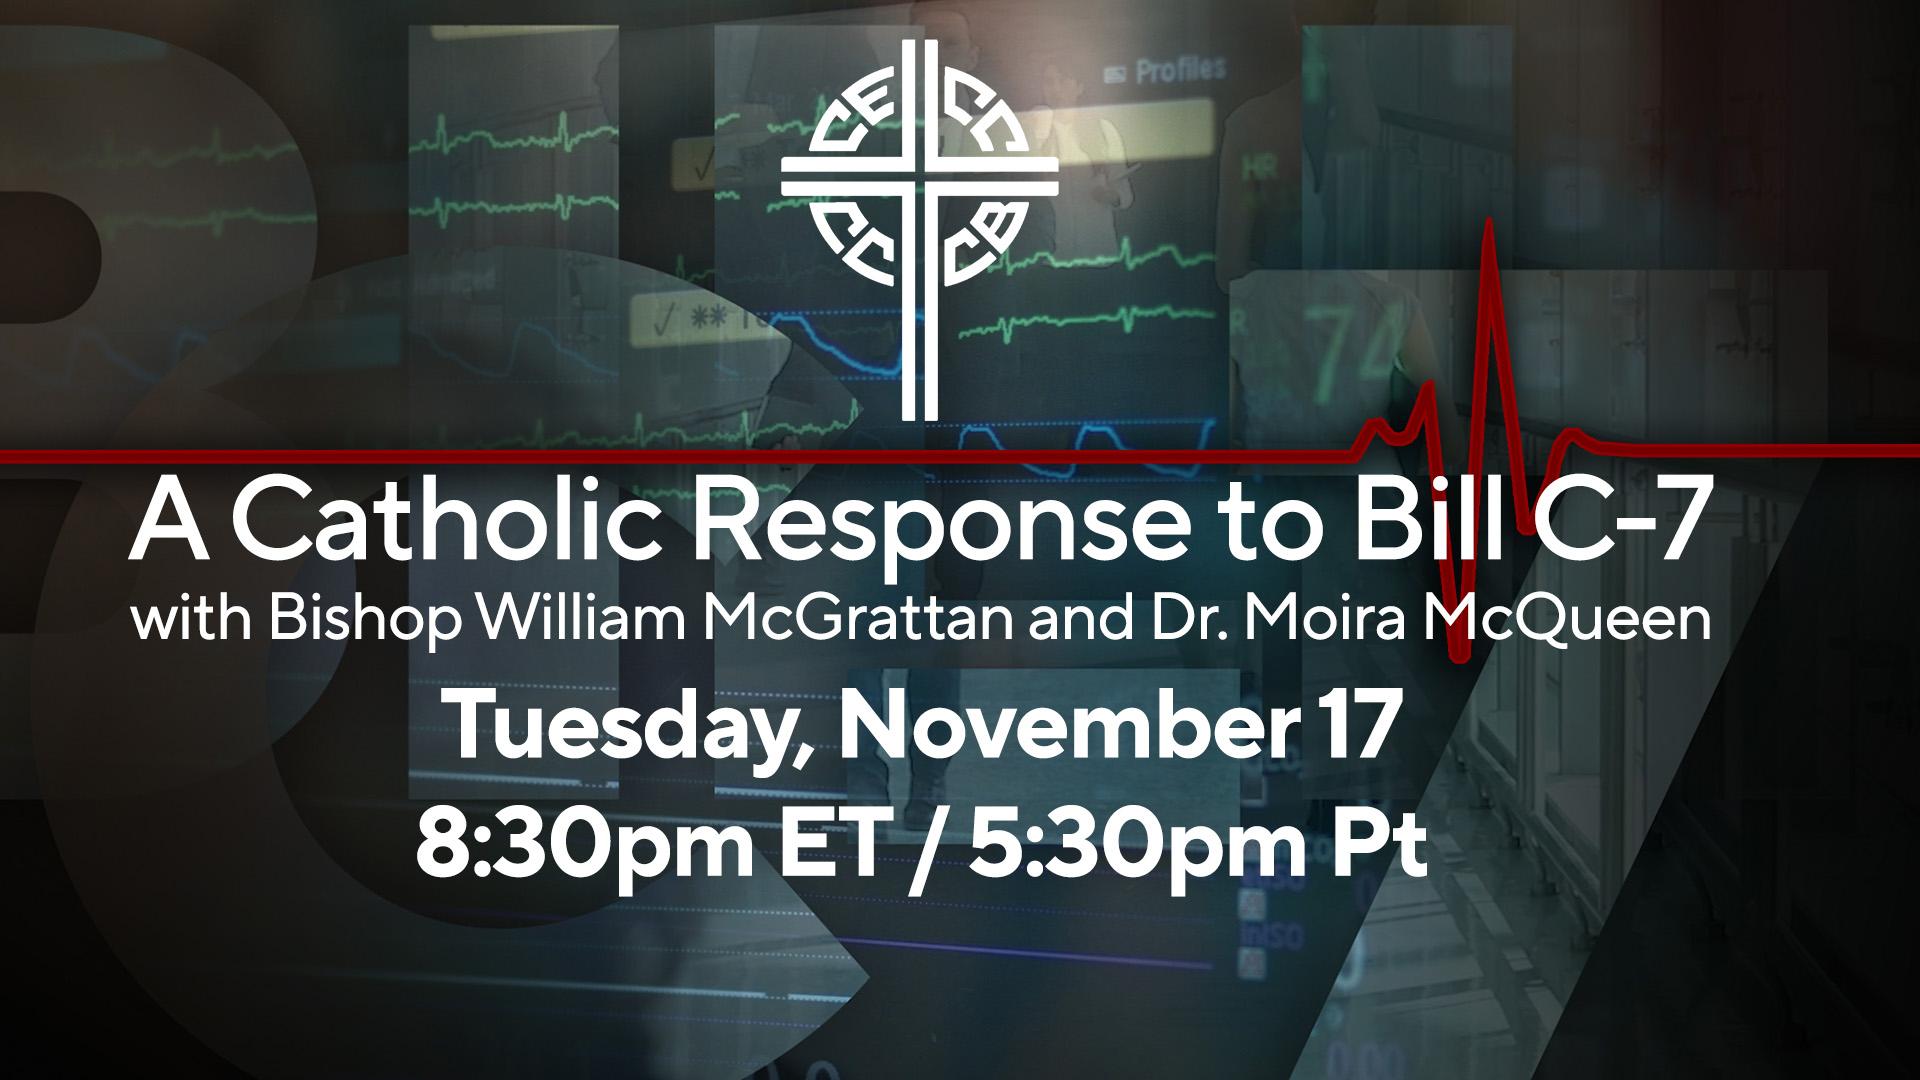 A Catholic Response to Bill C-7